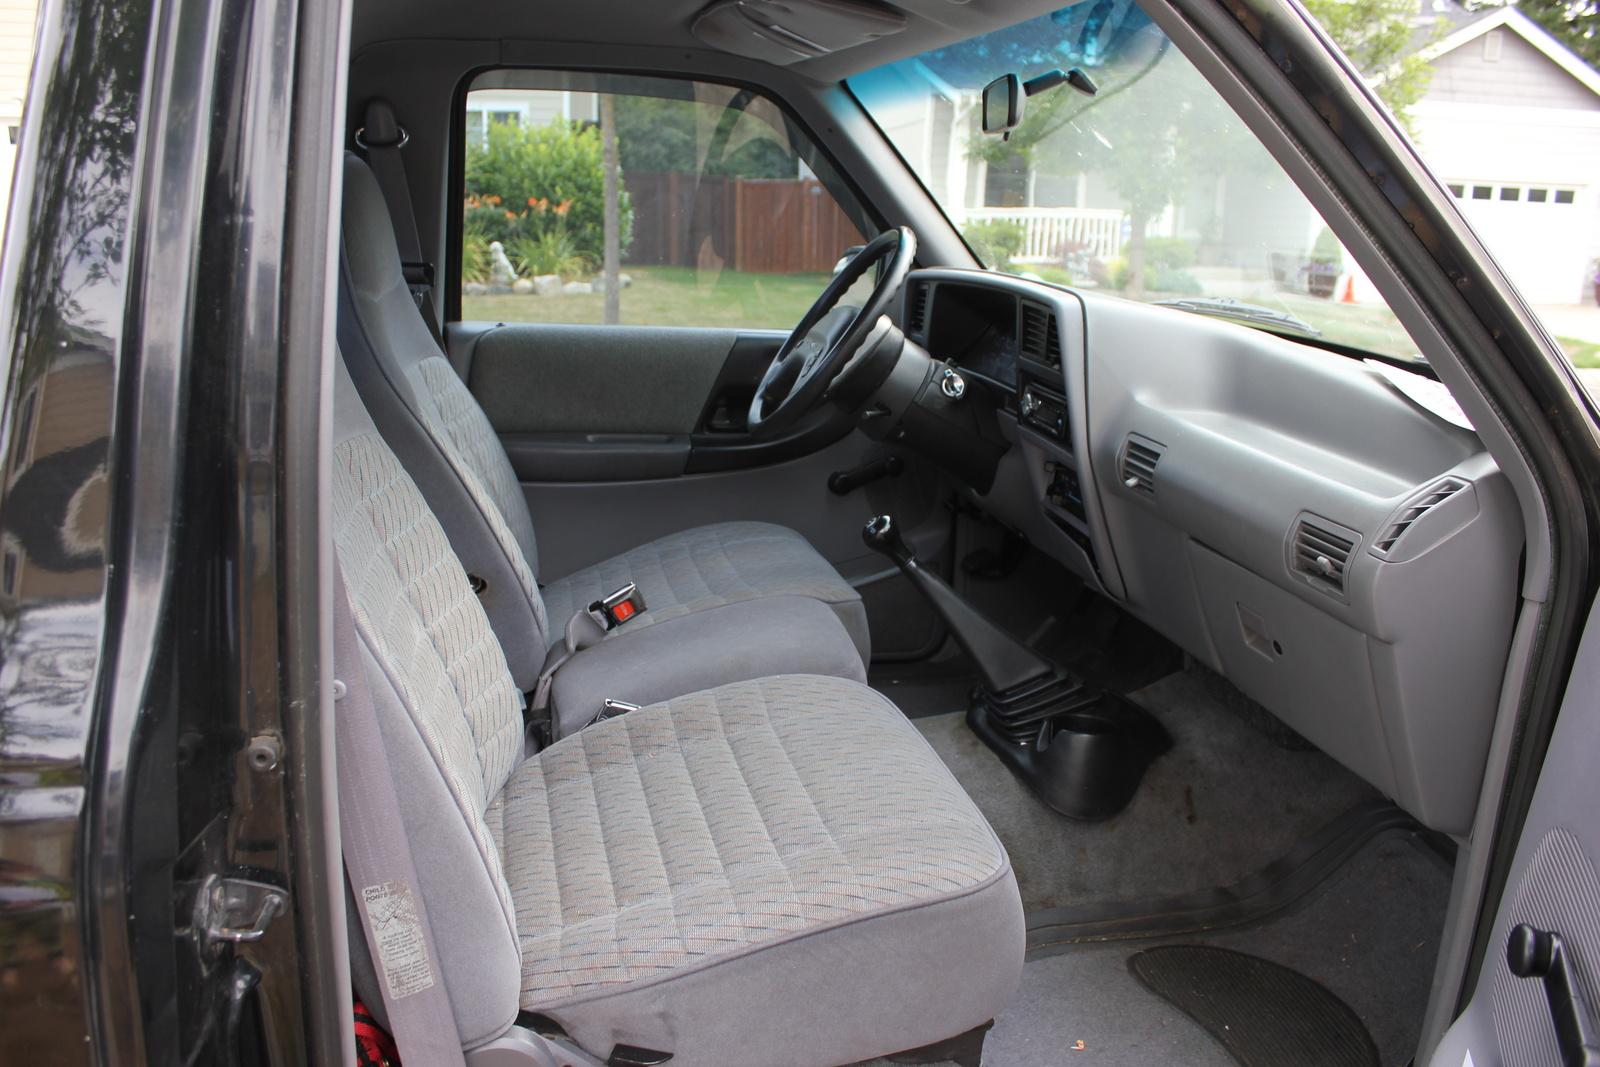 picture of 1994 ford ranger splash standard cab stepside sb interior - 2002 Ford Ranger Interior